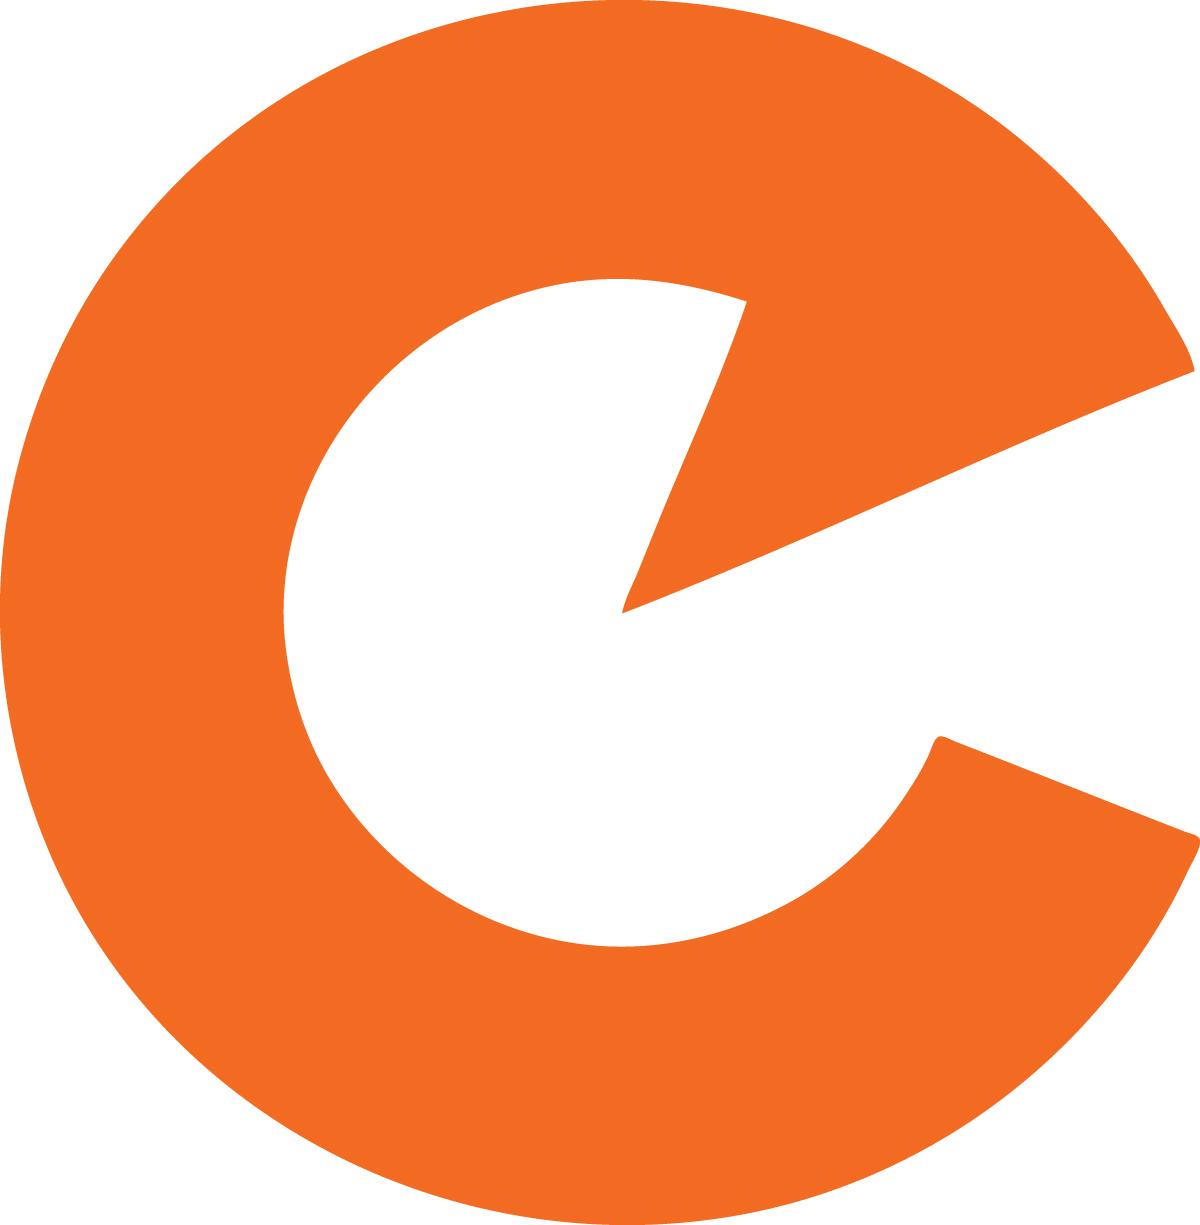 Easyweb logo